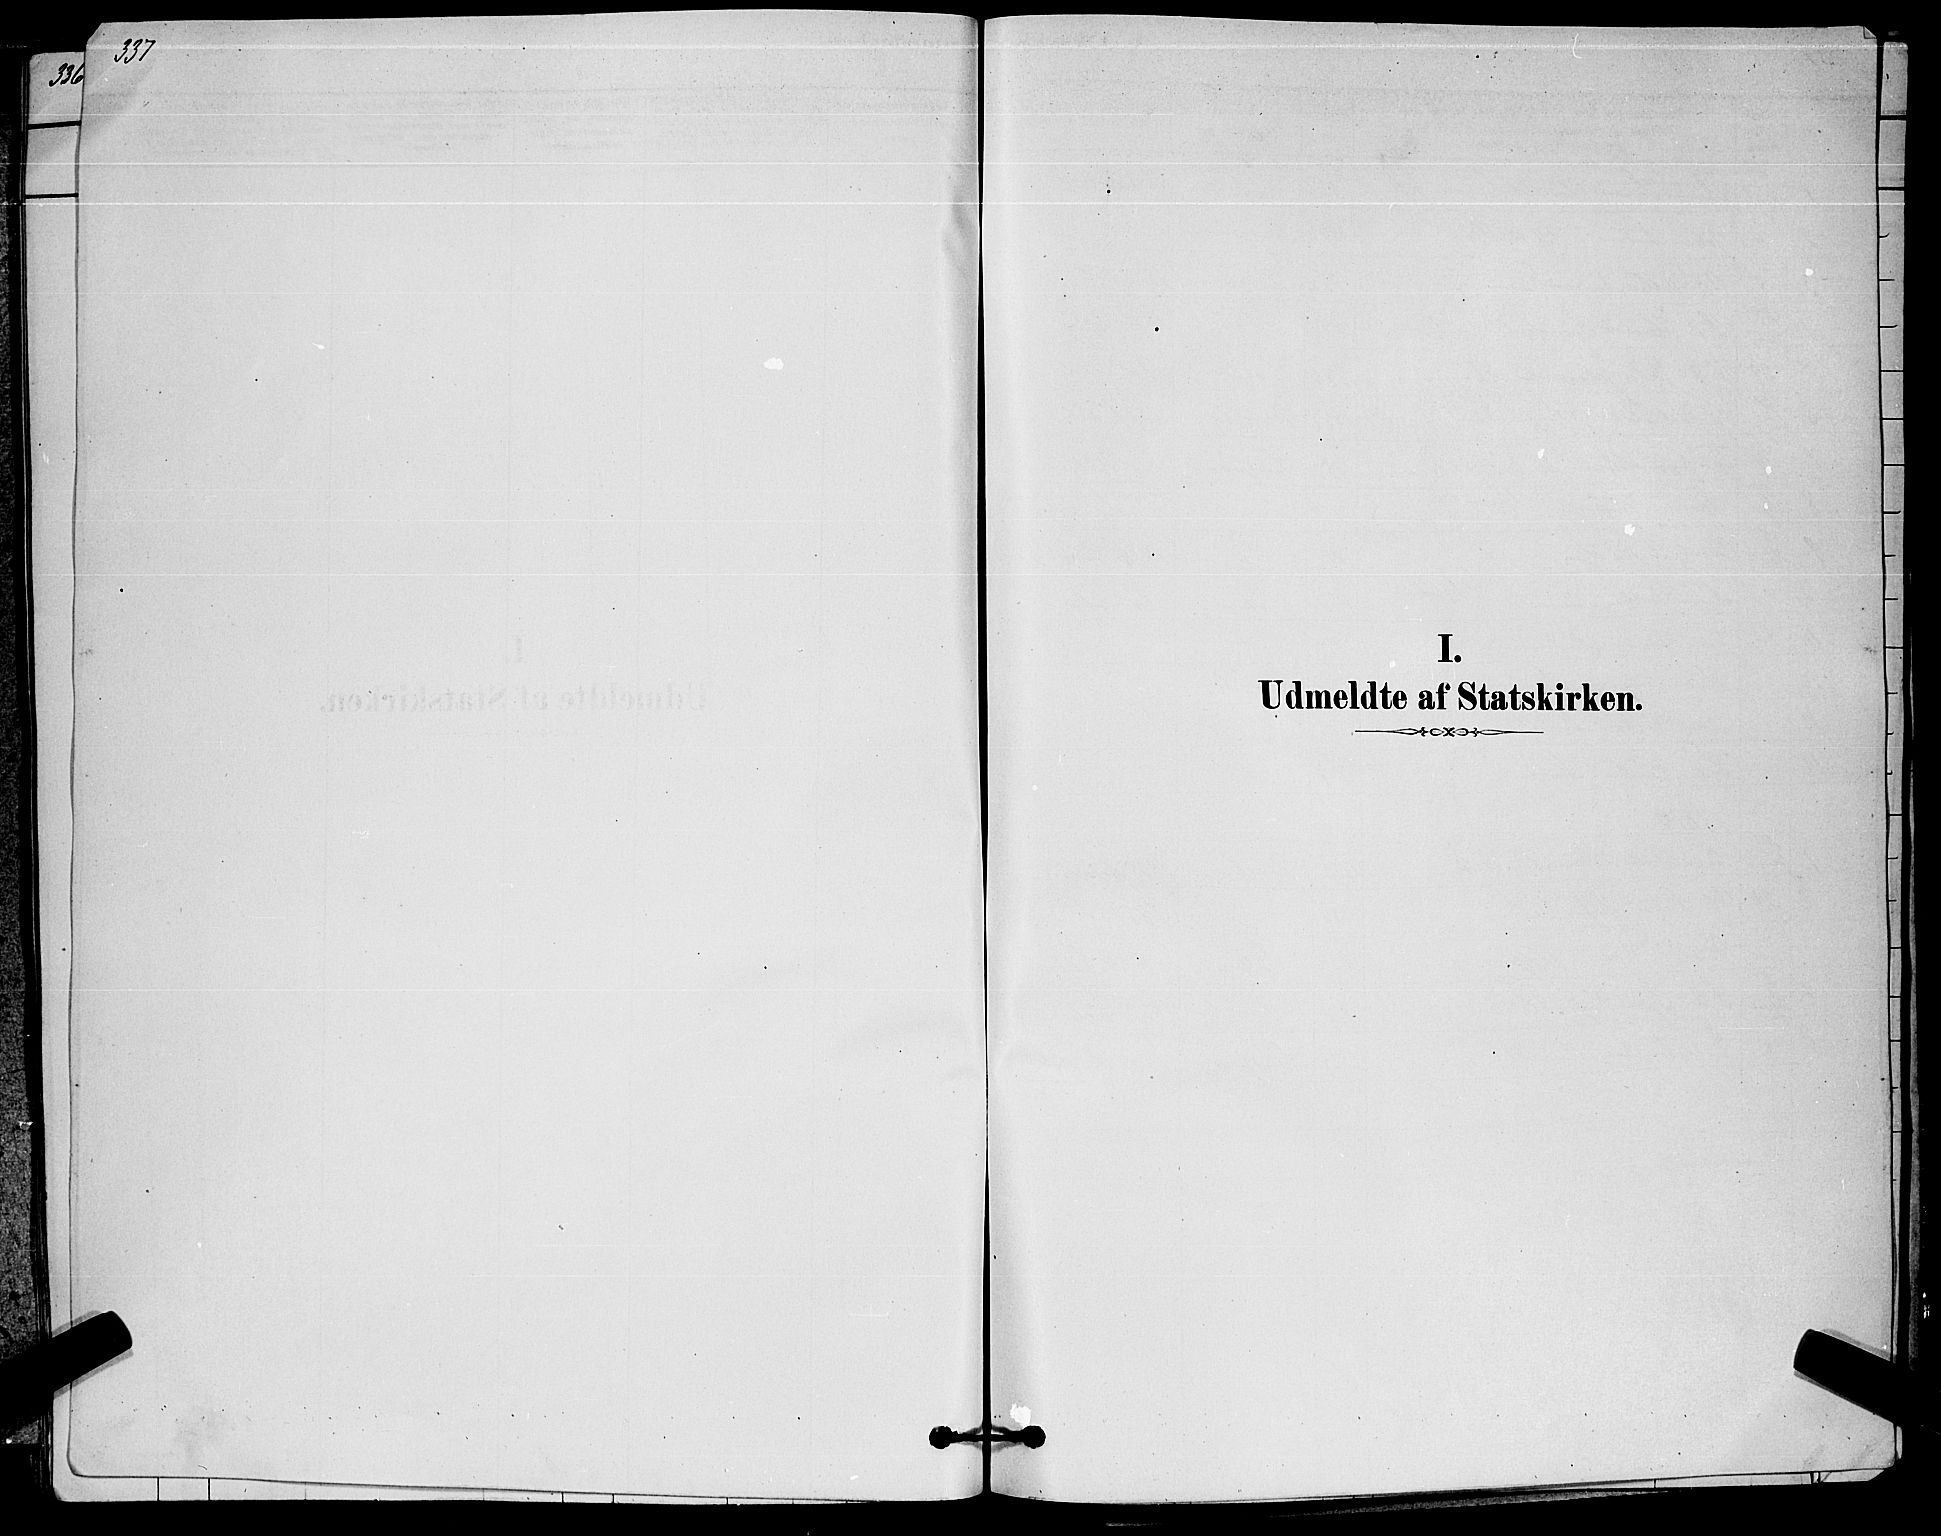 SAKO, Kongsberg kirkebøker, G/Ga/L0005: Parish register (copy) no. 5, 1878-1889, p. 337